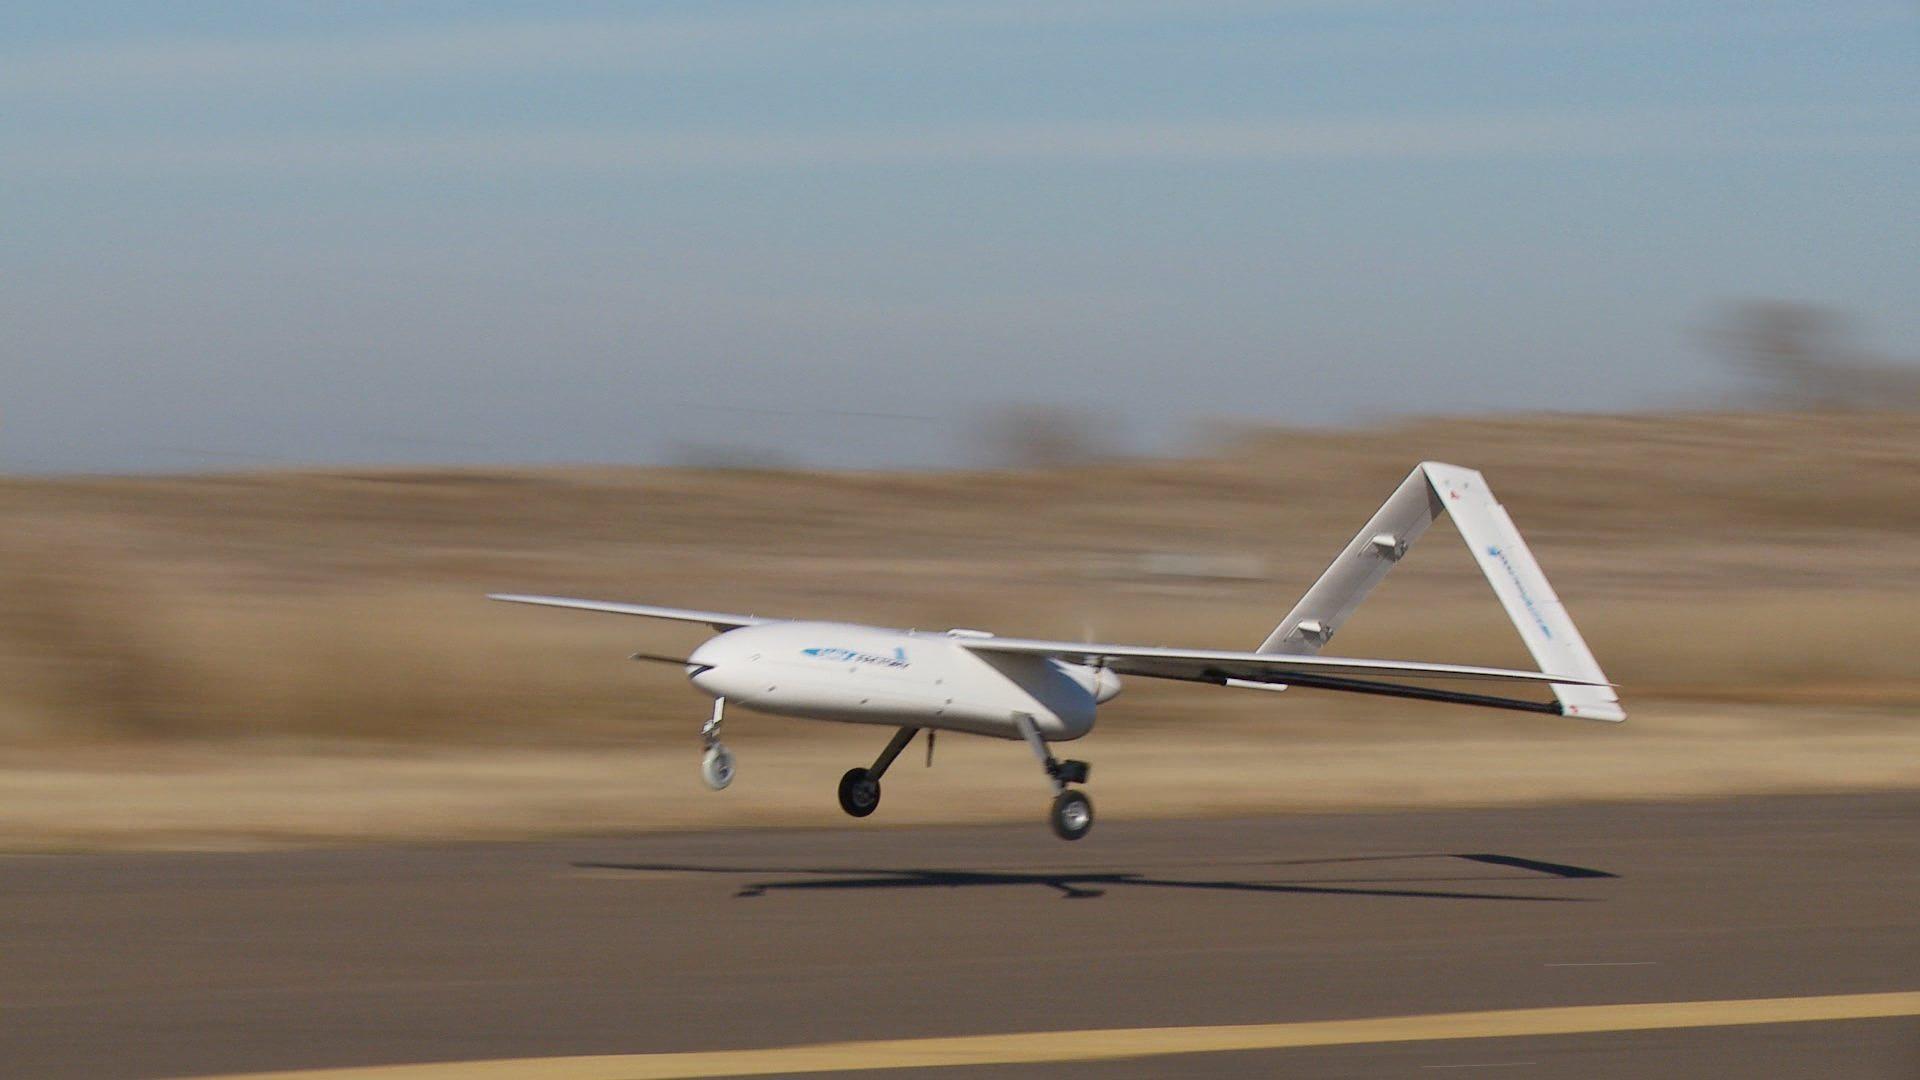 Penguin BE UAV platform